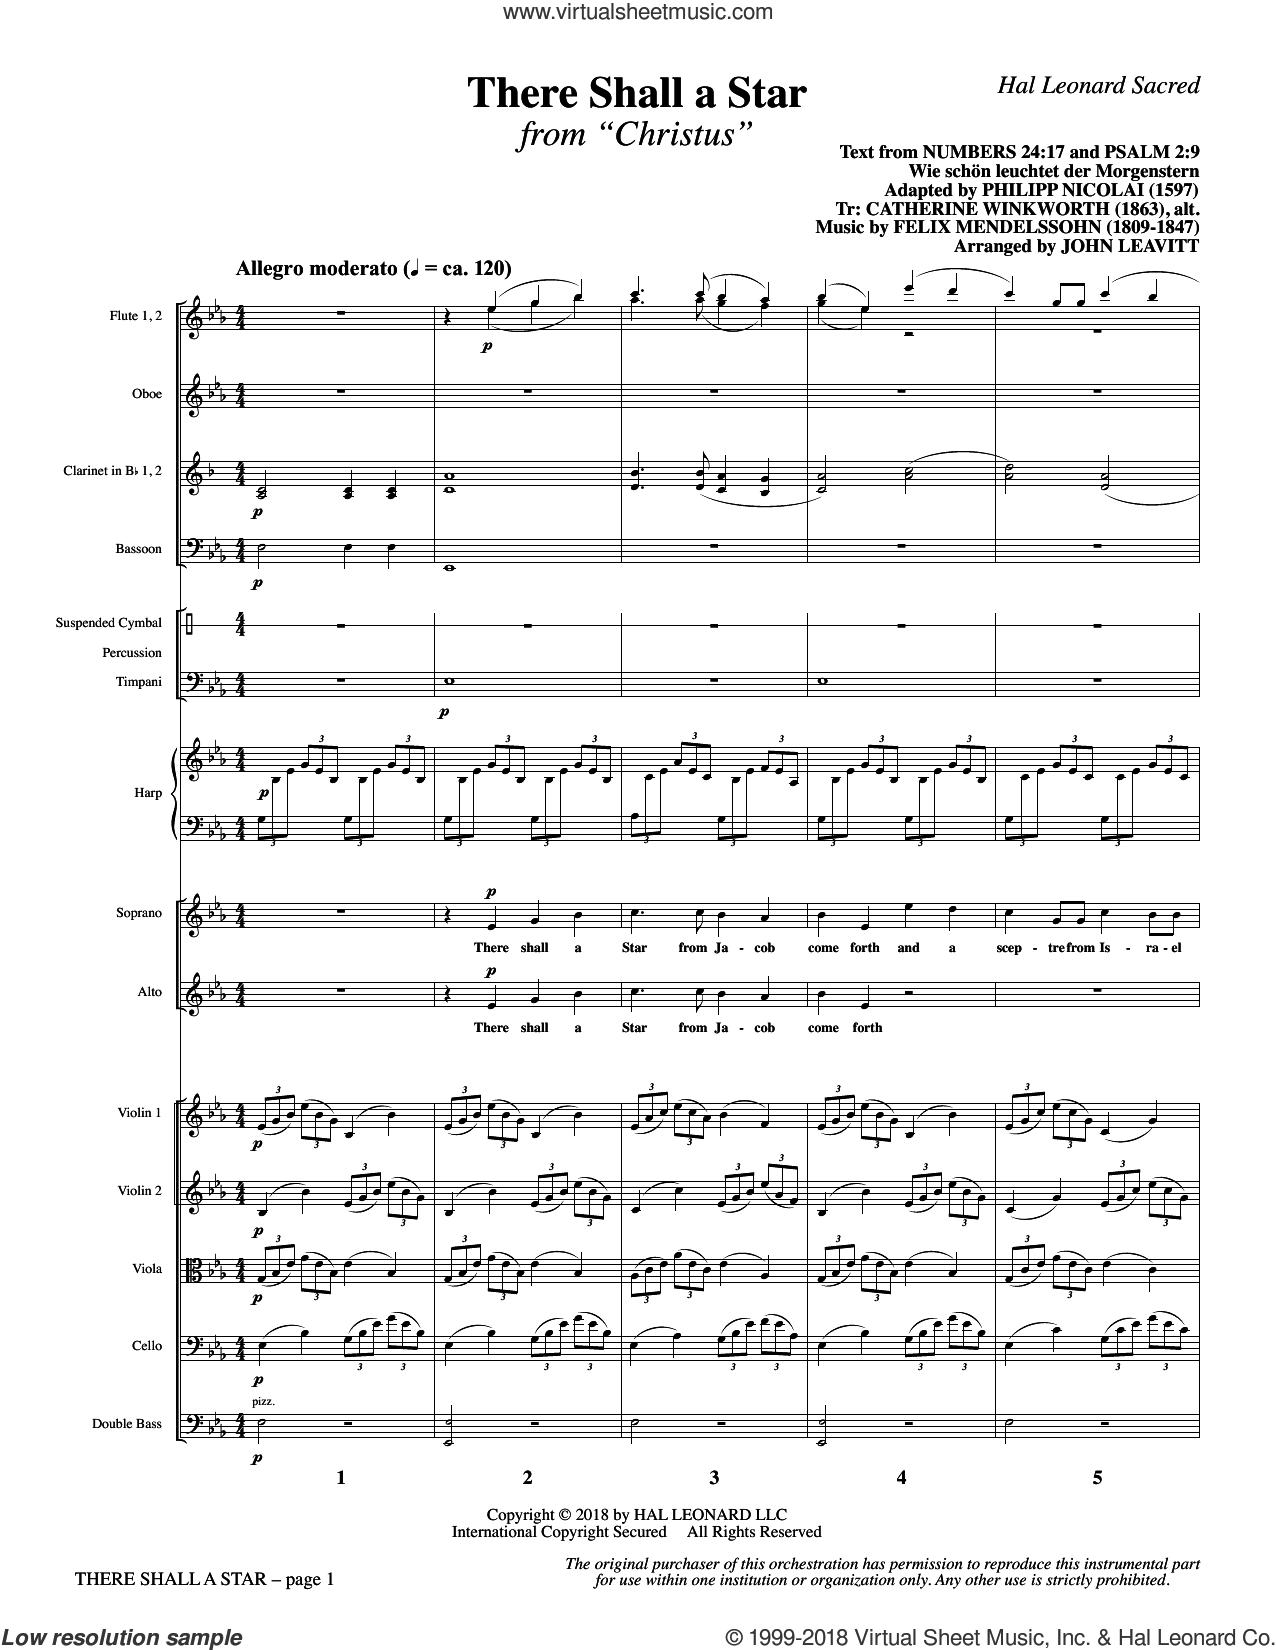 There Shall a Star (COMPLETE) sheet music for orchestra/band by Felix Mendelssohn-Bartholdy and John Leavitt, intermediate skill level